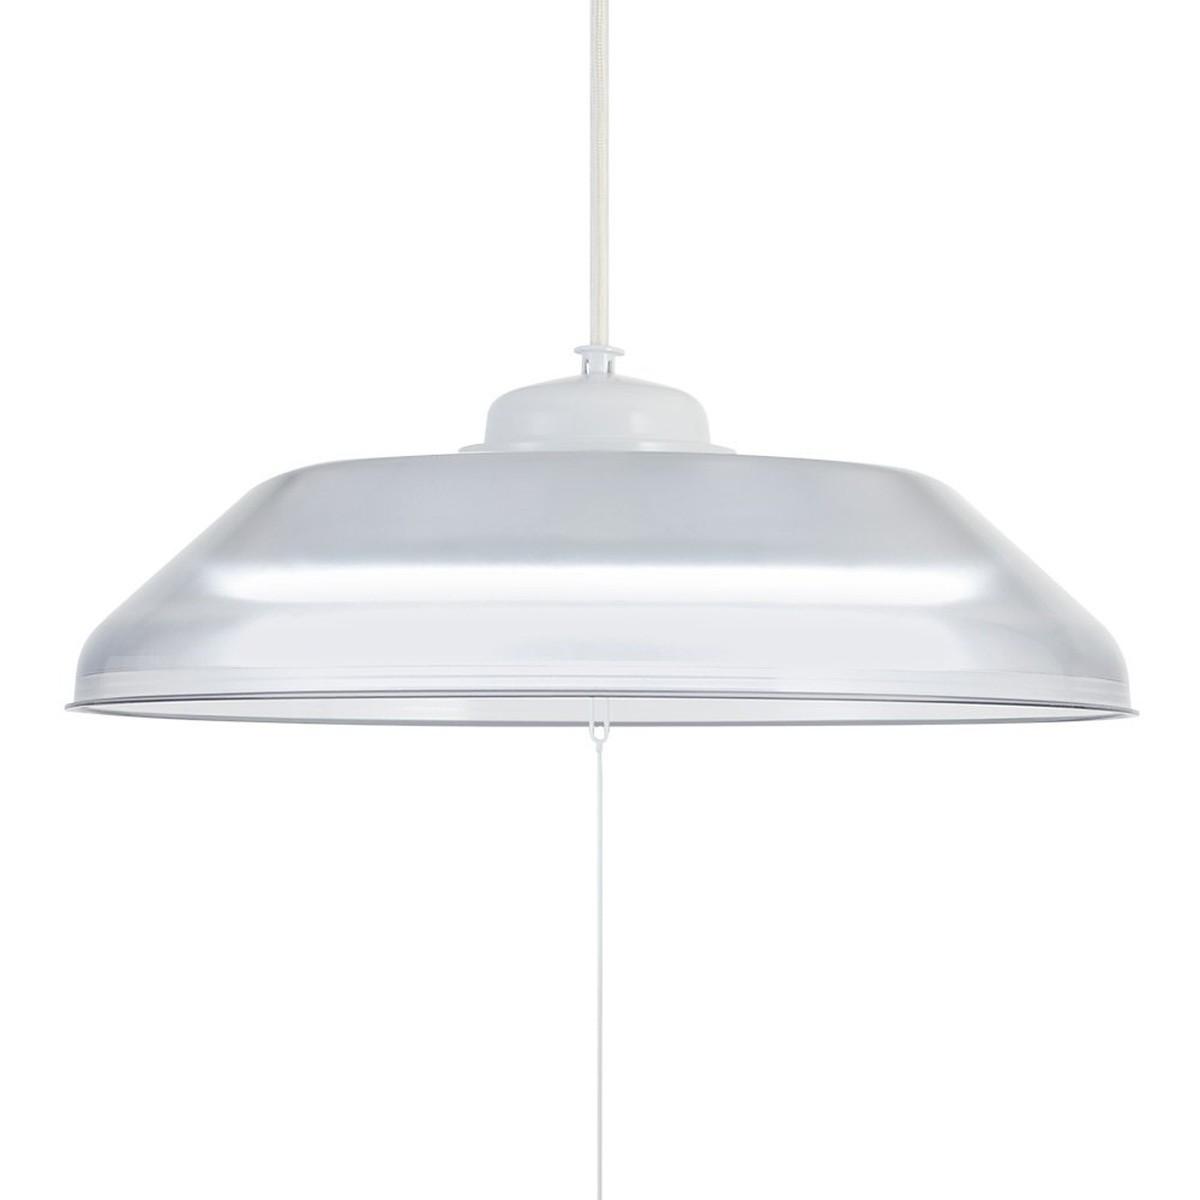 NEC LED洋風ペンダントライト 調光タイプ~6畳 HCDA0668-X【クーポン配布中】